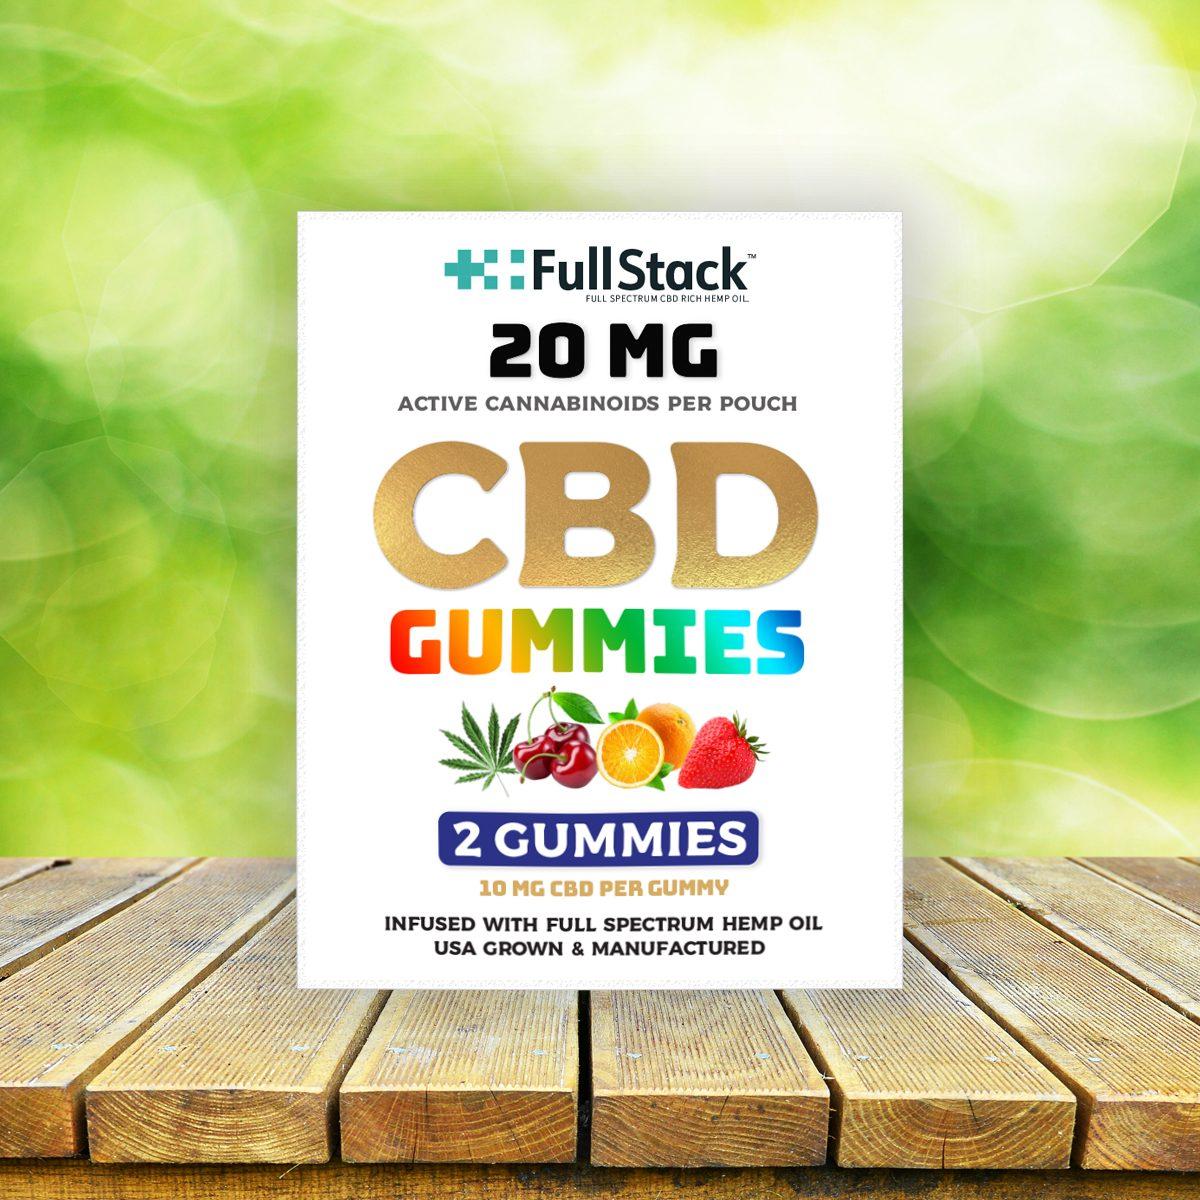 fullstack cbd gummies 2 pack 20mg